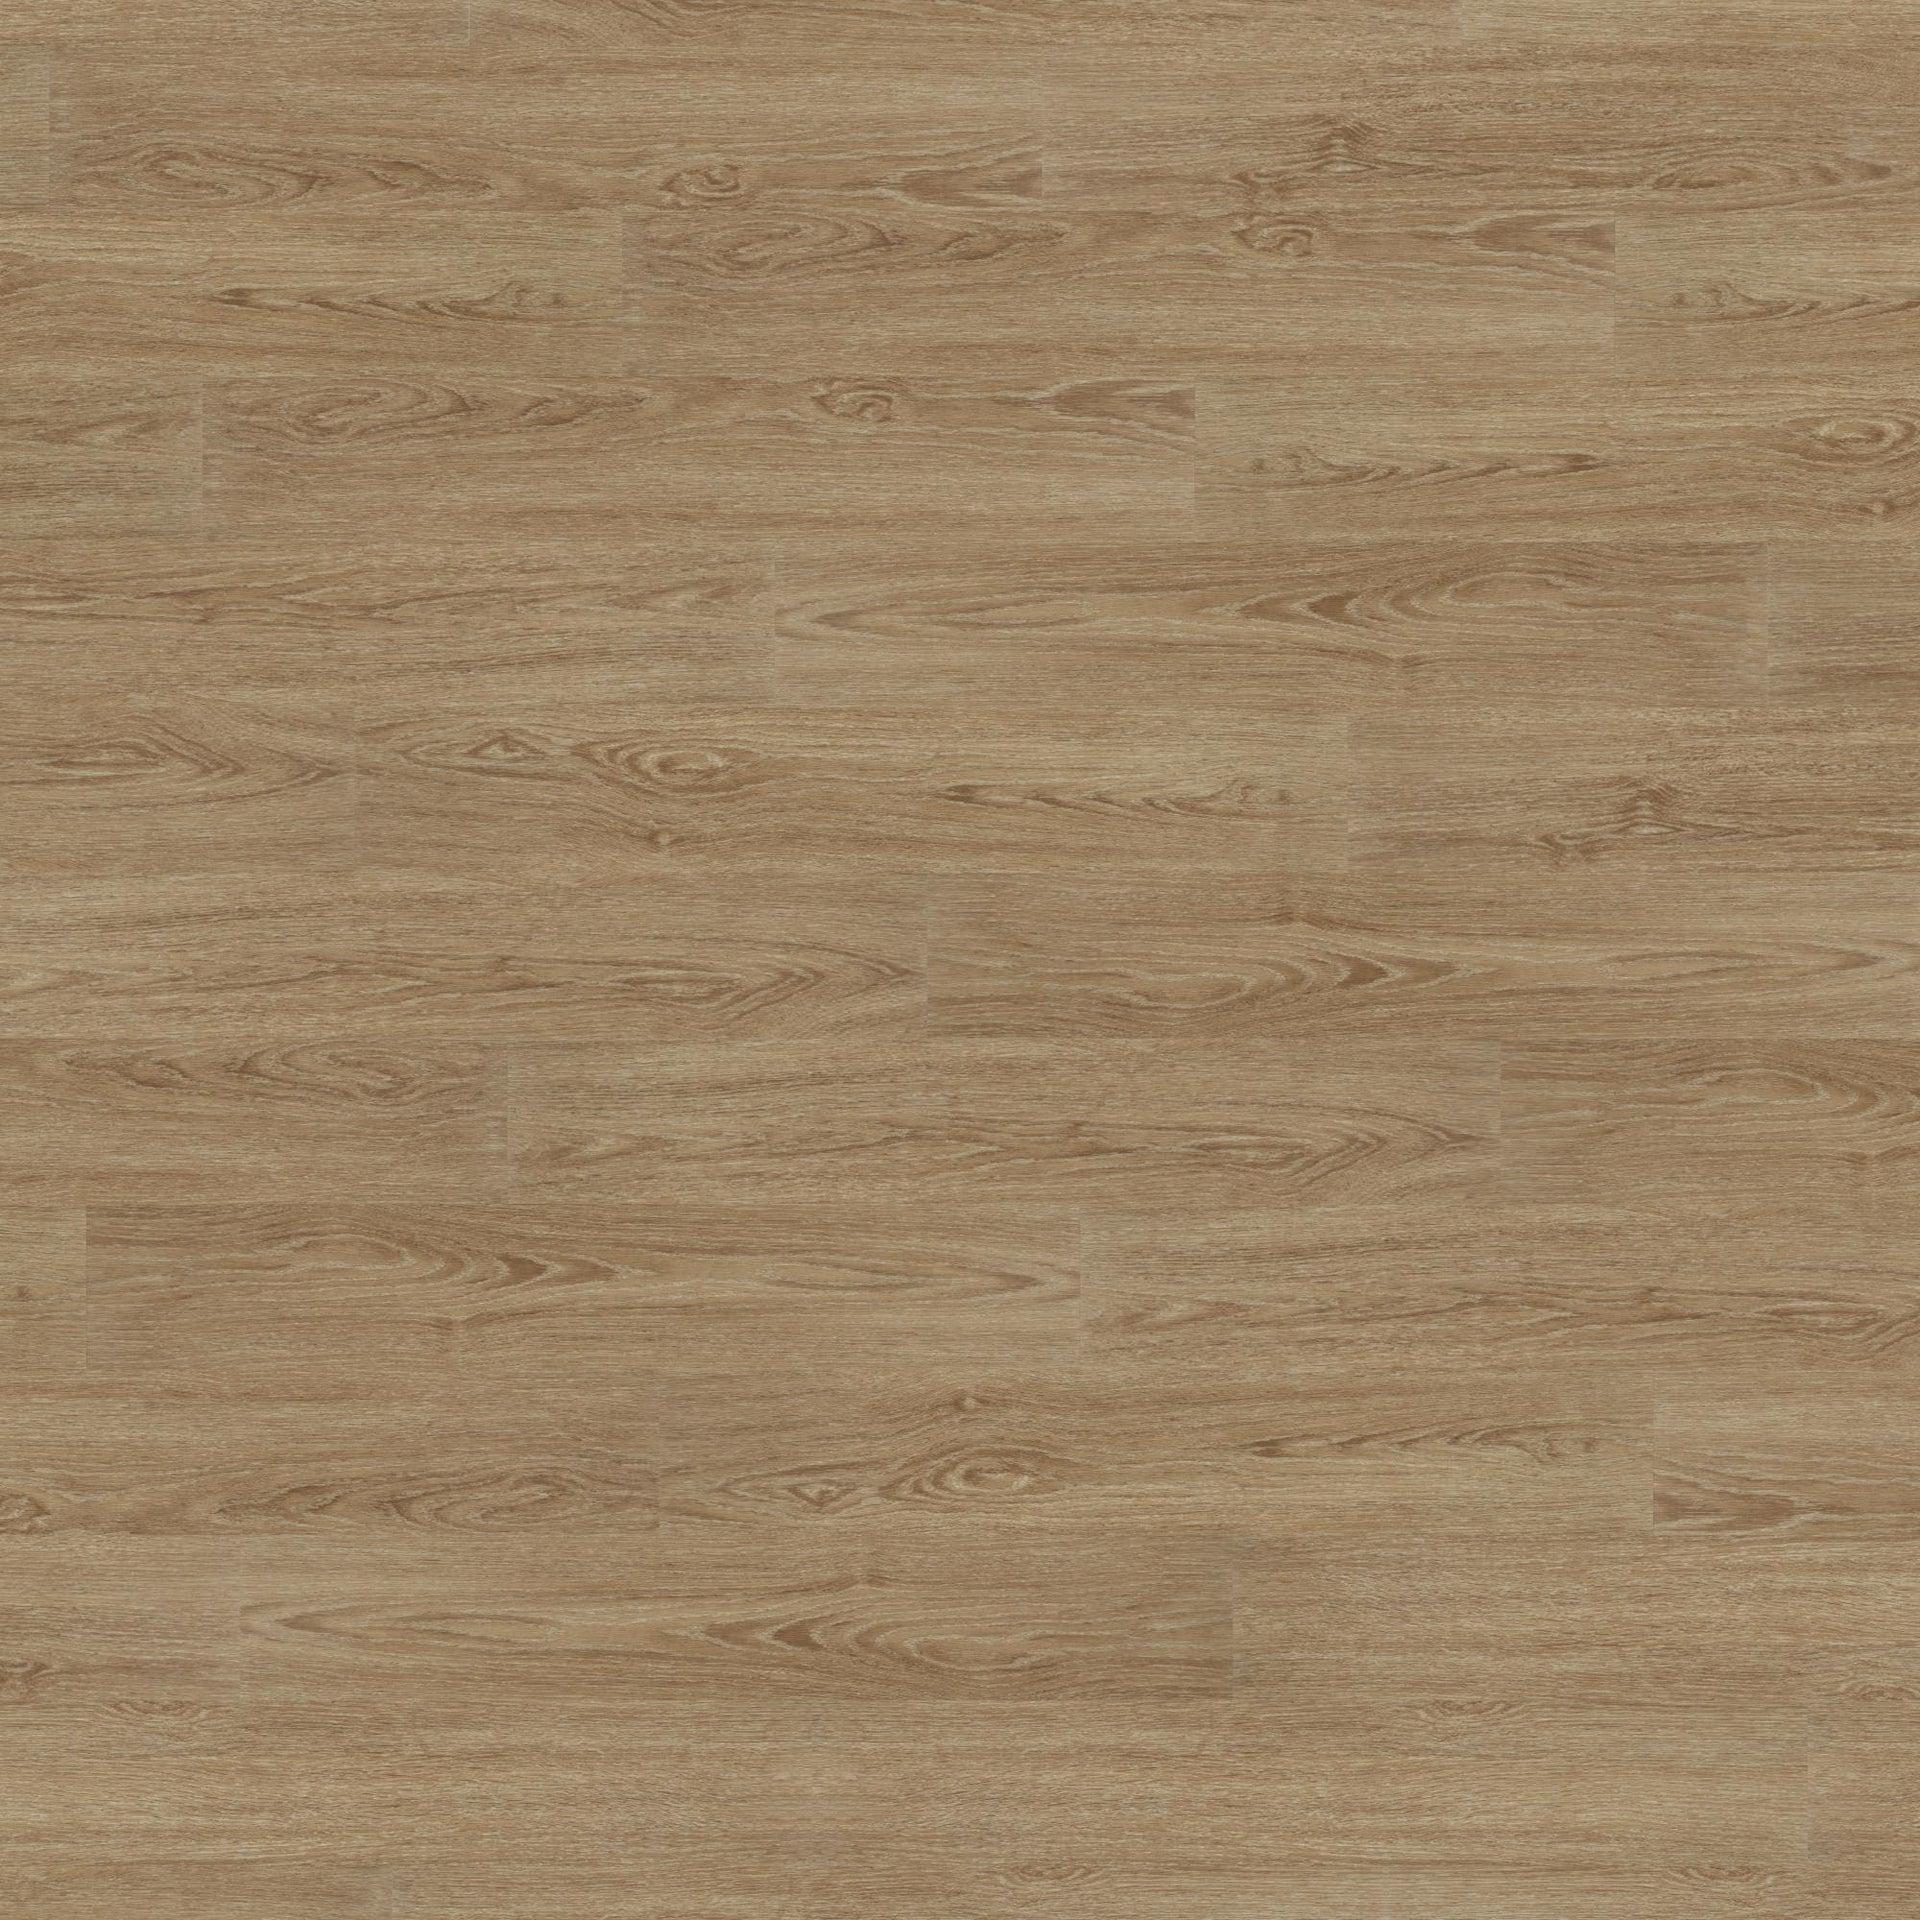 Pavimento PVC adesivo Sadema Sp 2 mm beige - 6